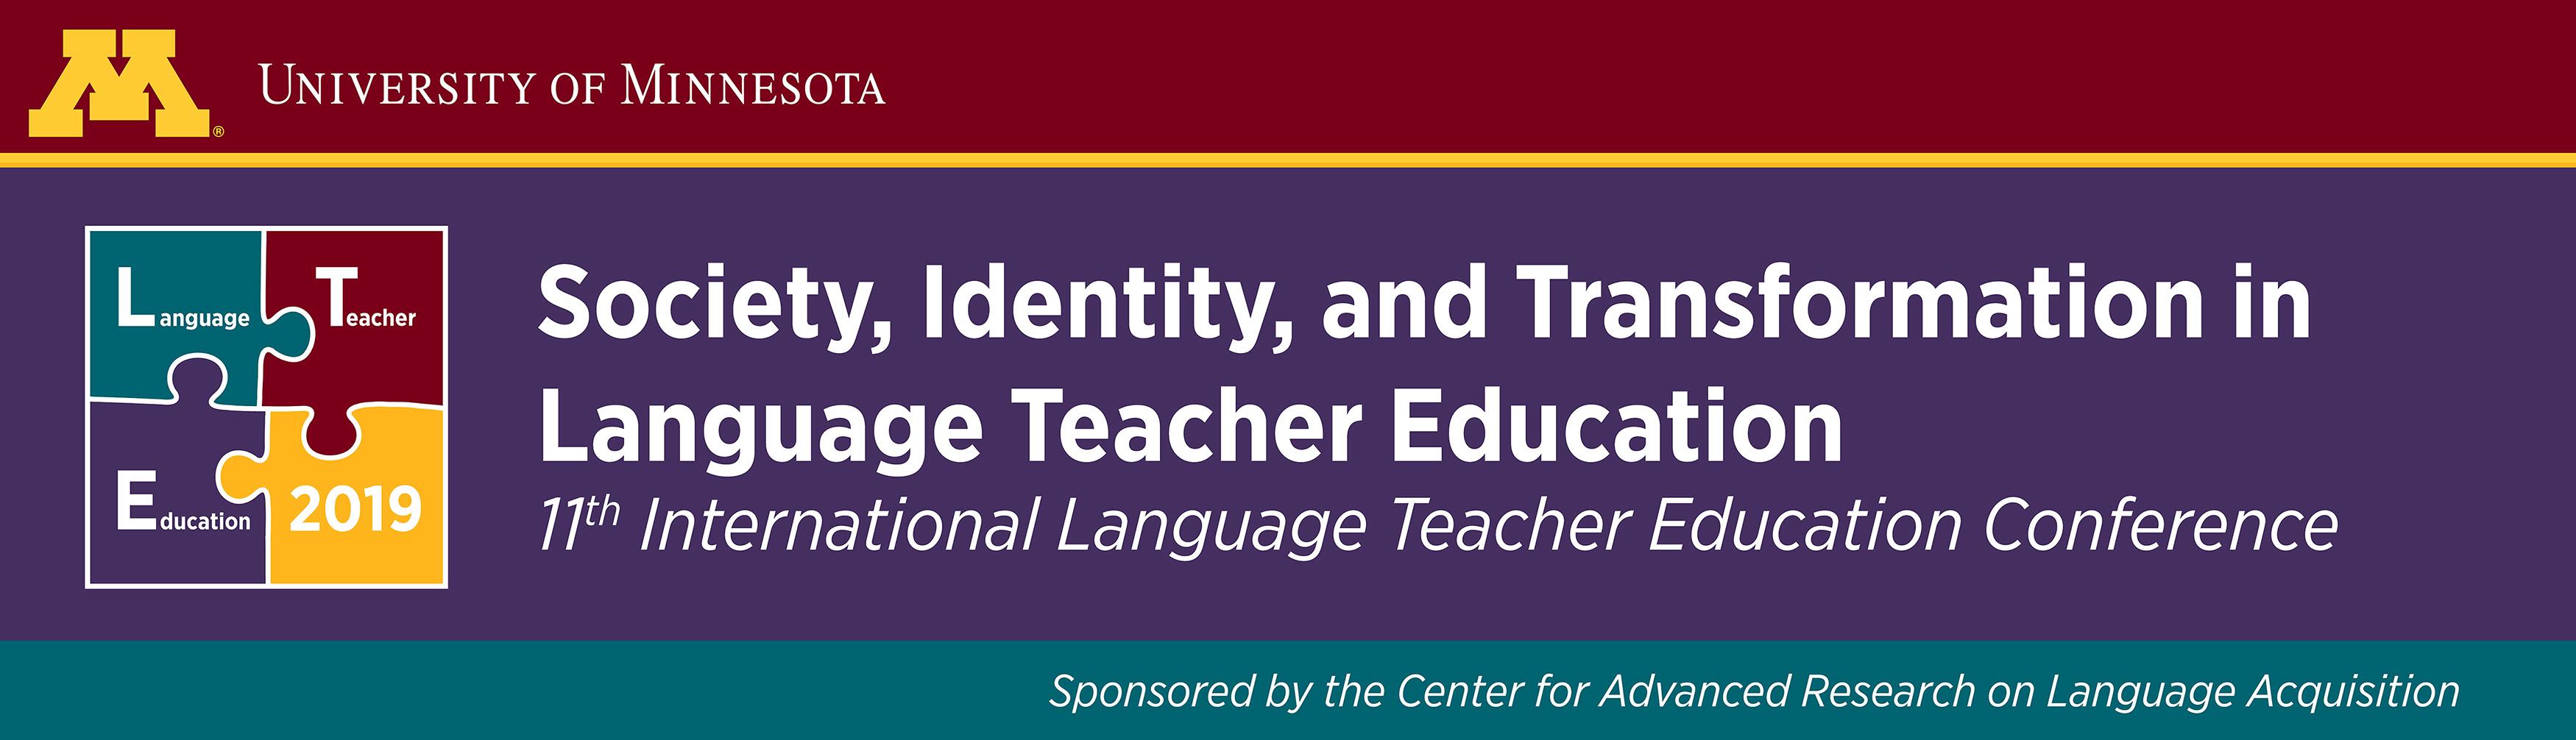 11th International Language Teacher Education Conference, University